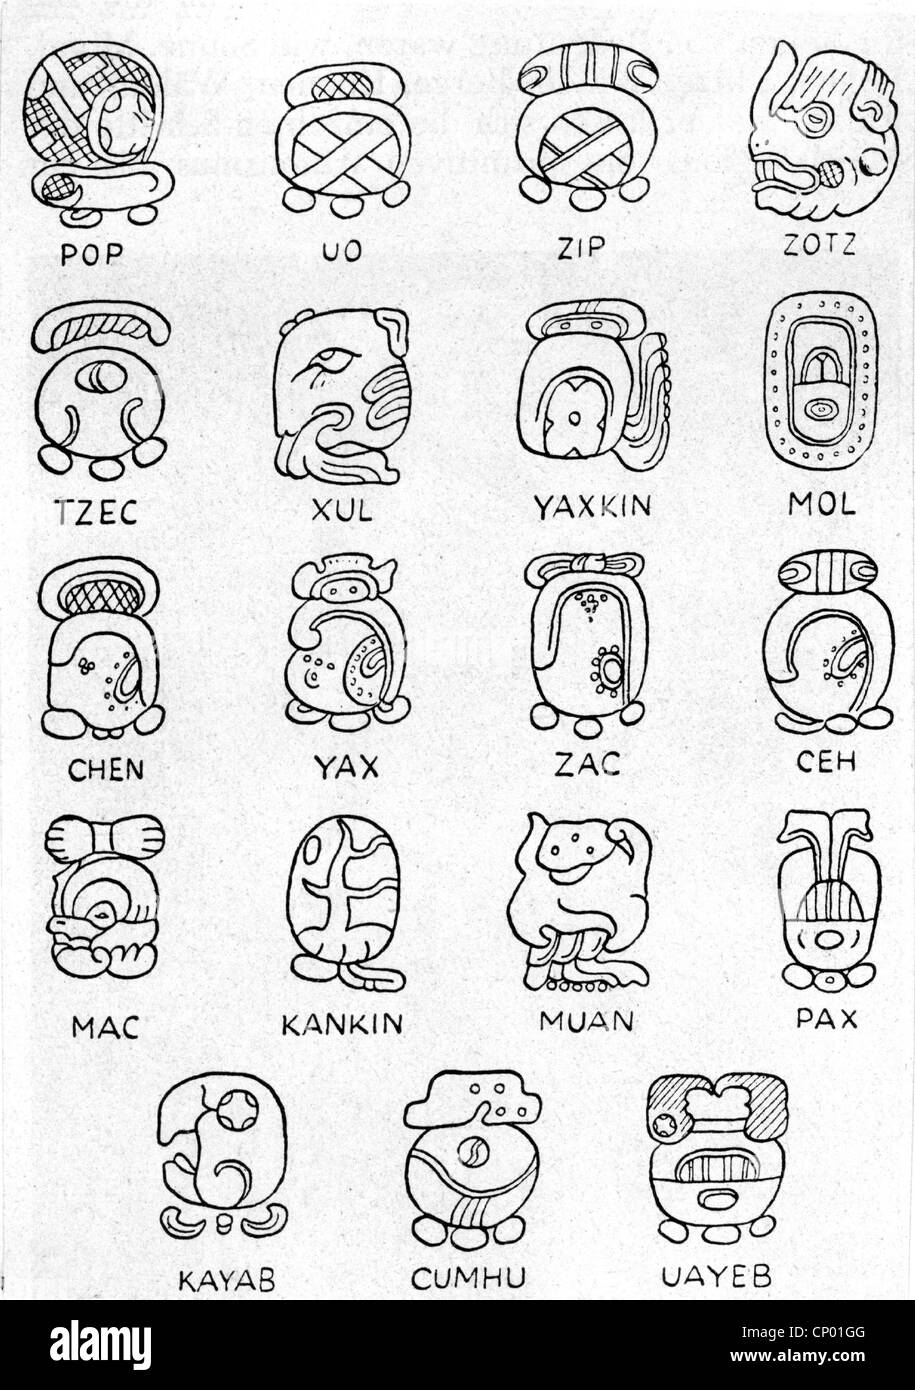 writing, script, South America, Maya, month symbols of the Maya